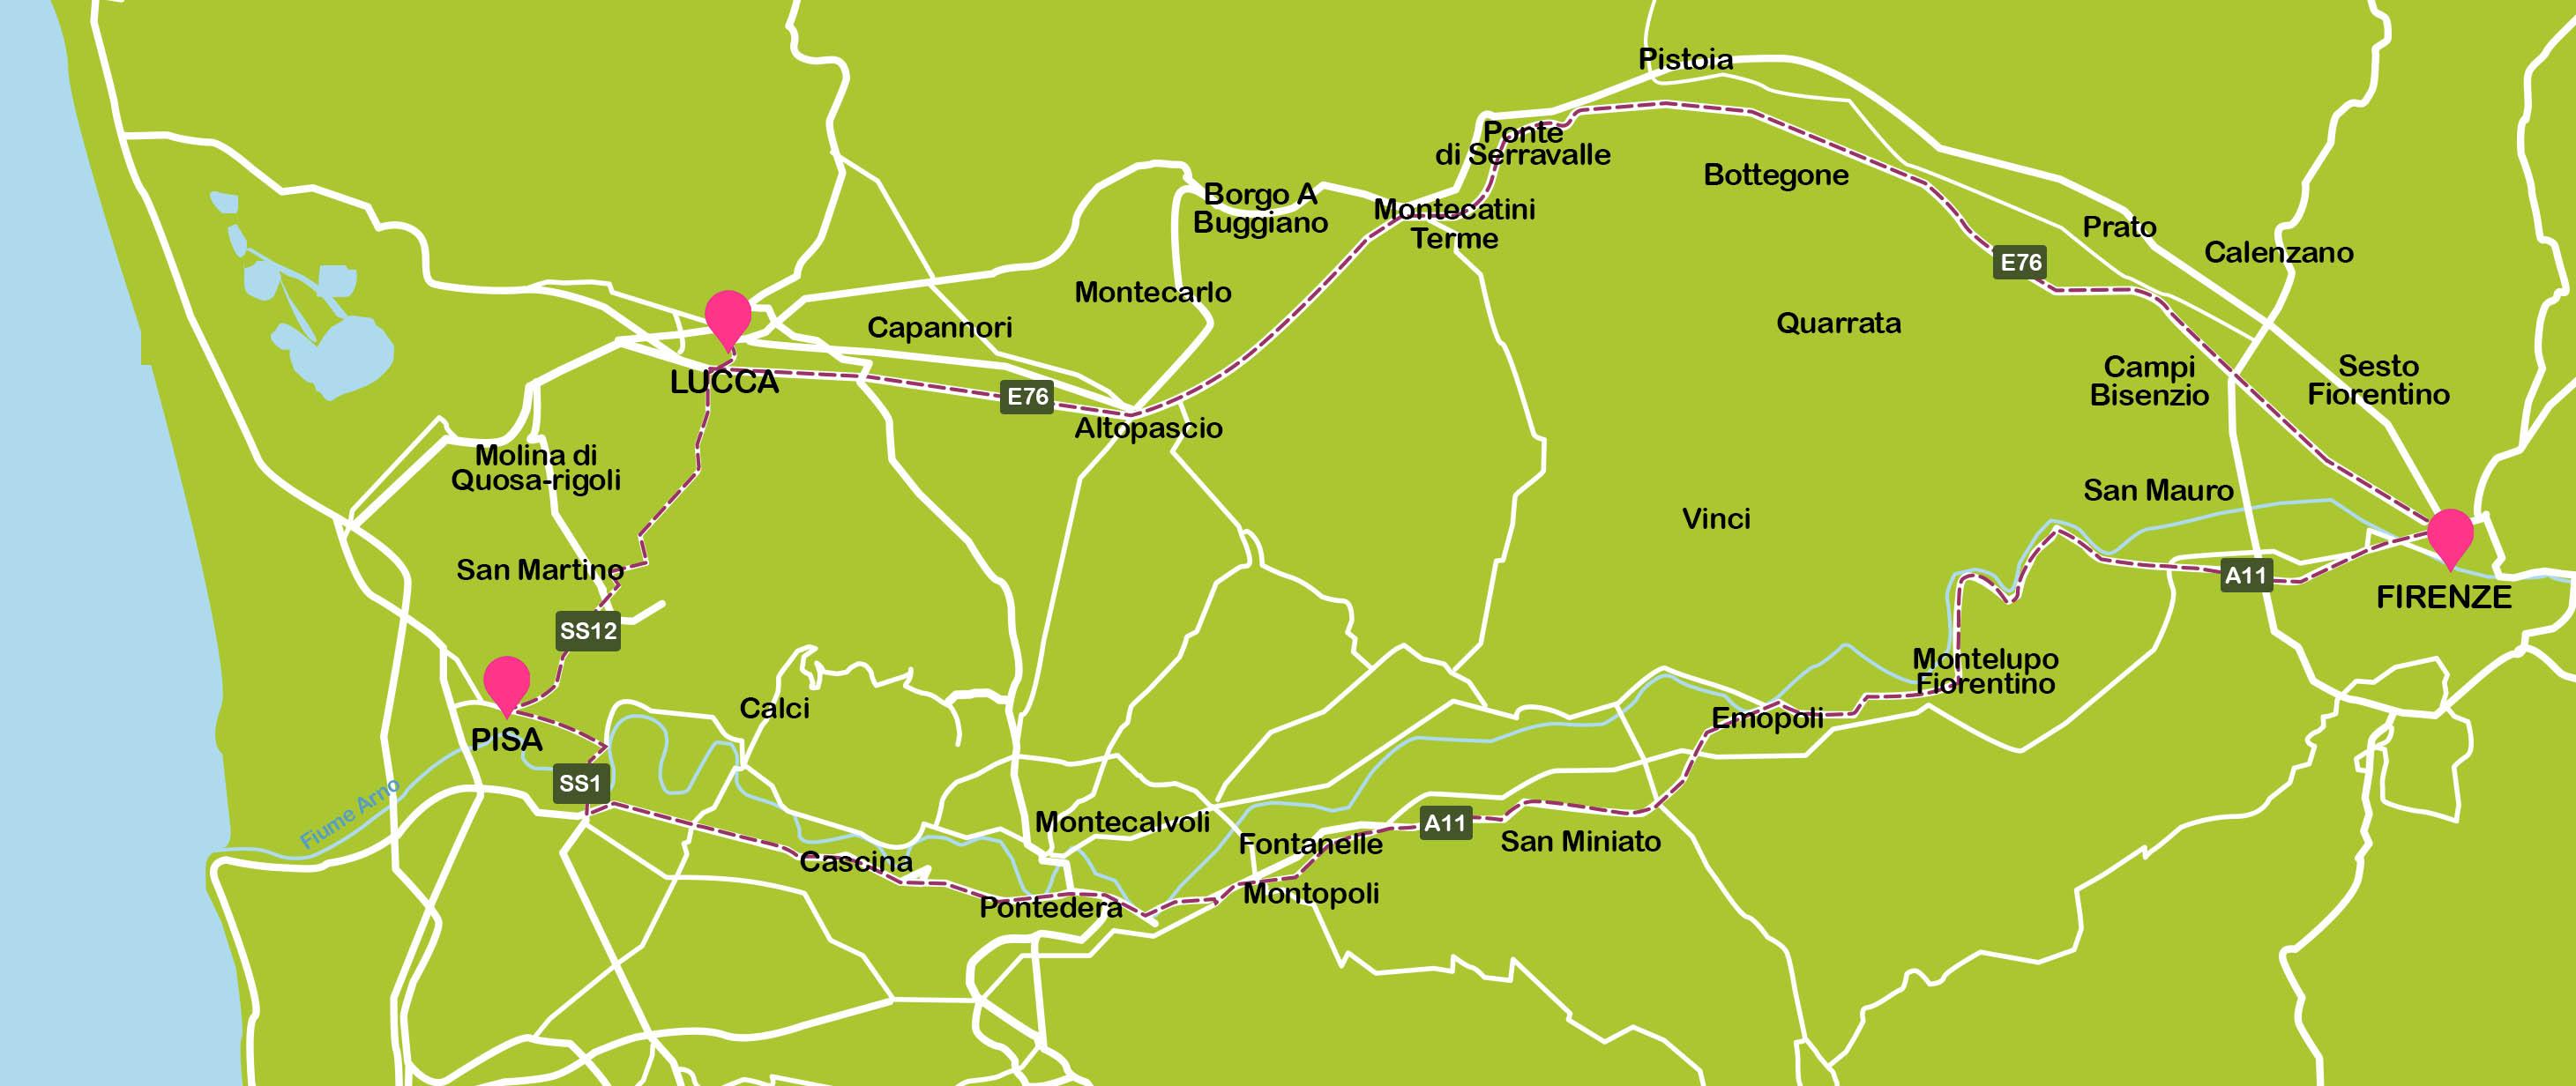 Mapa De Toscana Plano Con Rutas Turisticas